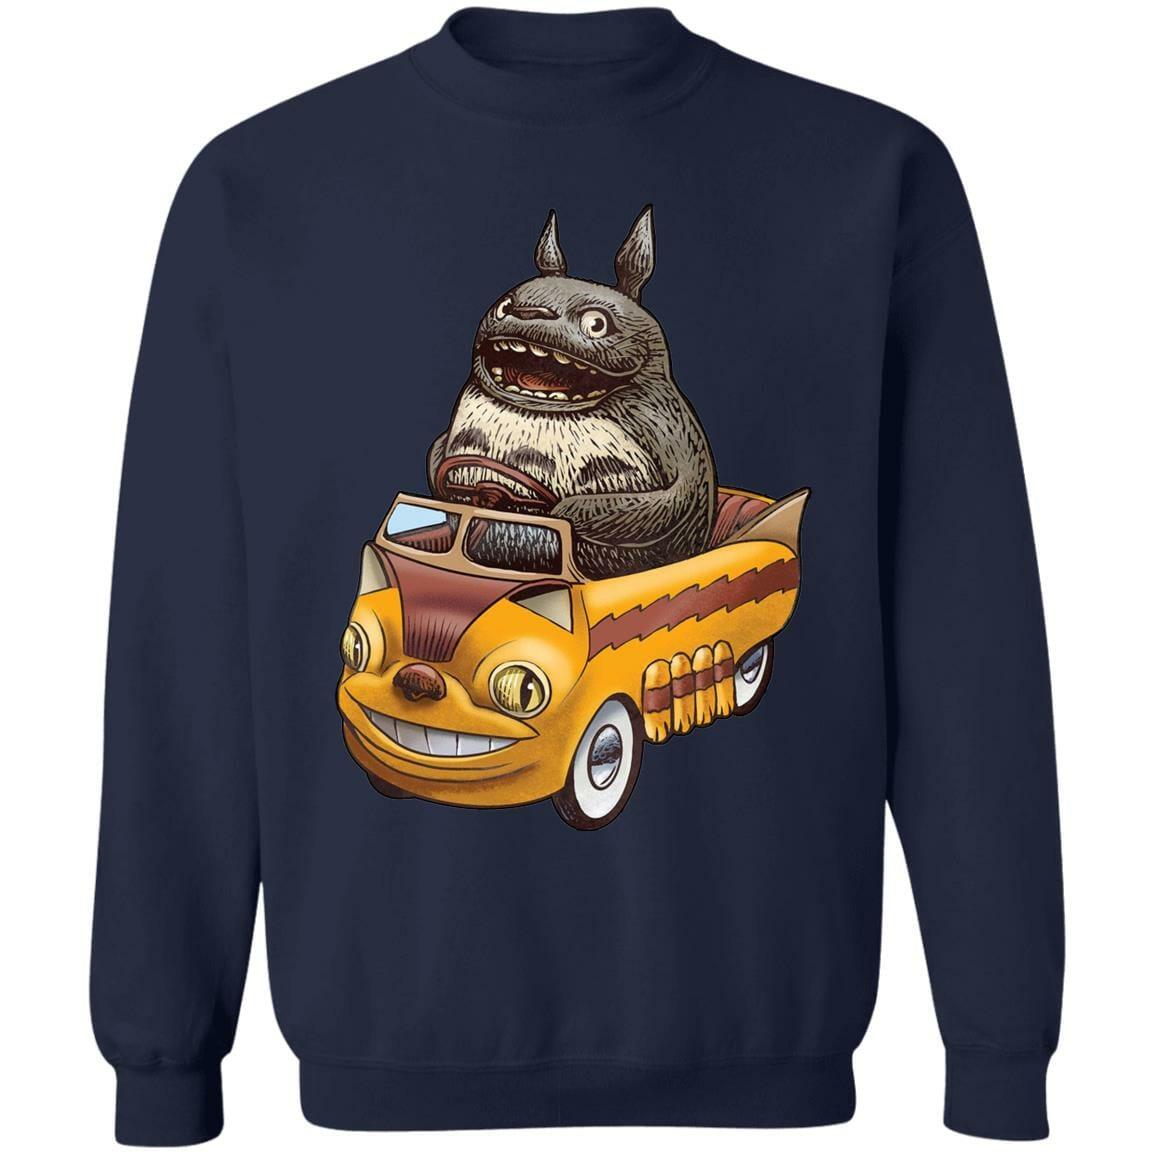 Totoro driving Catbus Sweatshirt